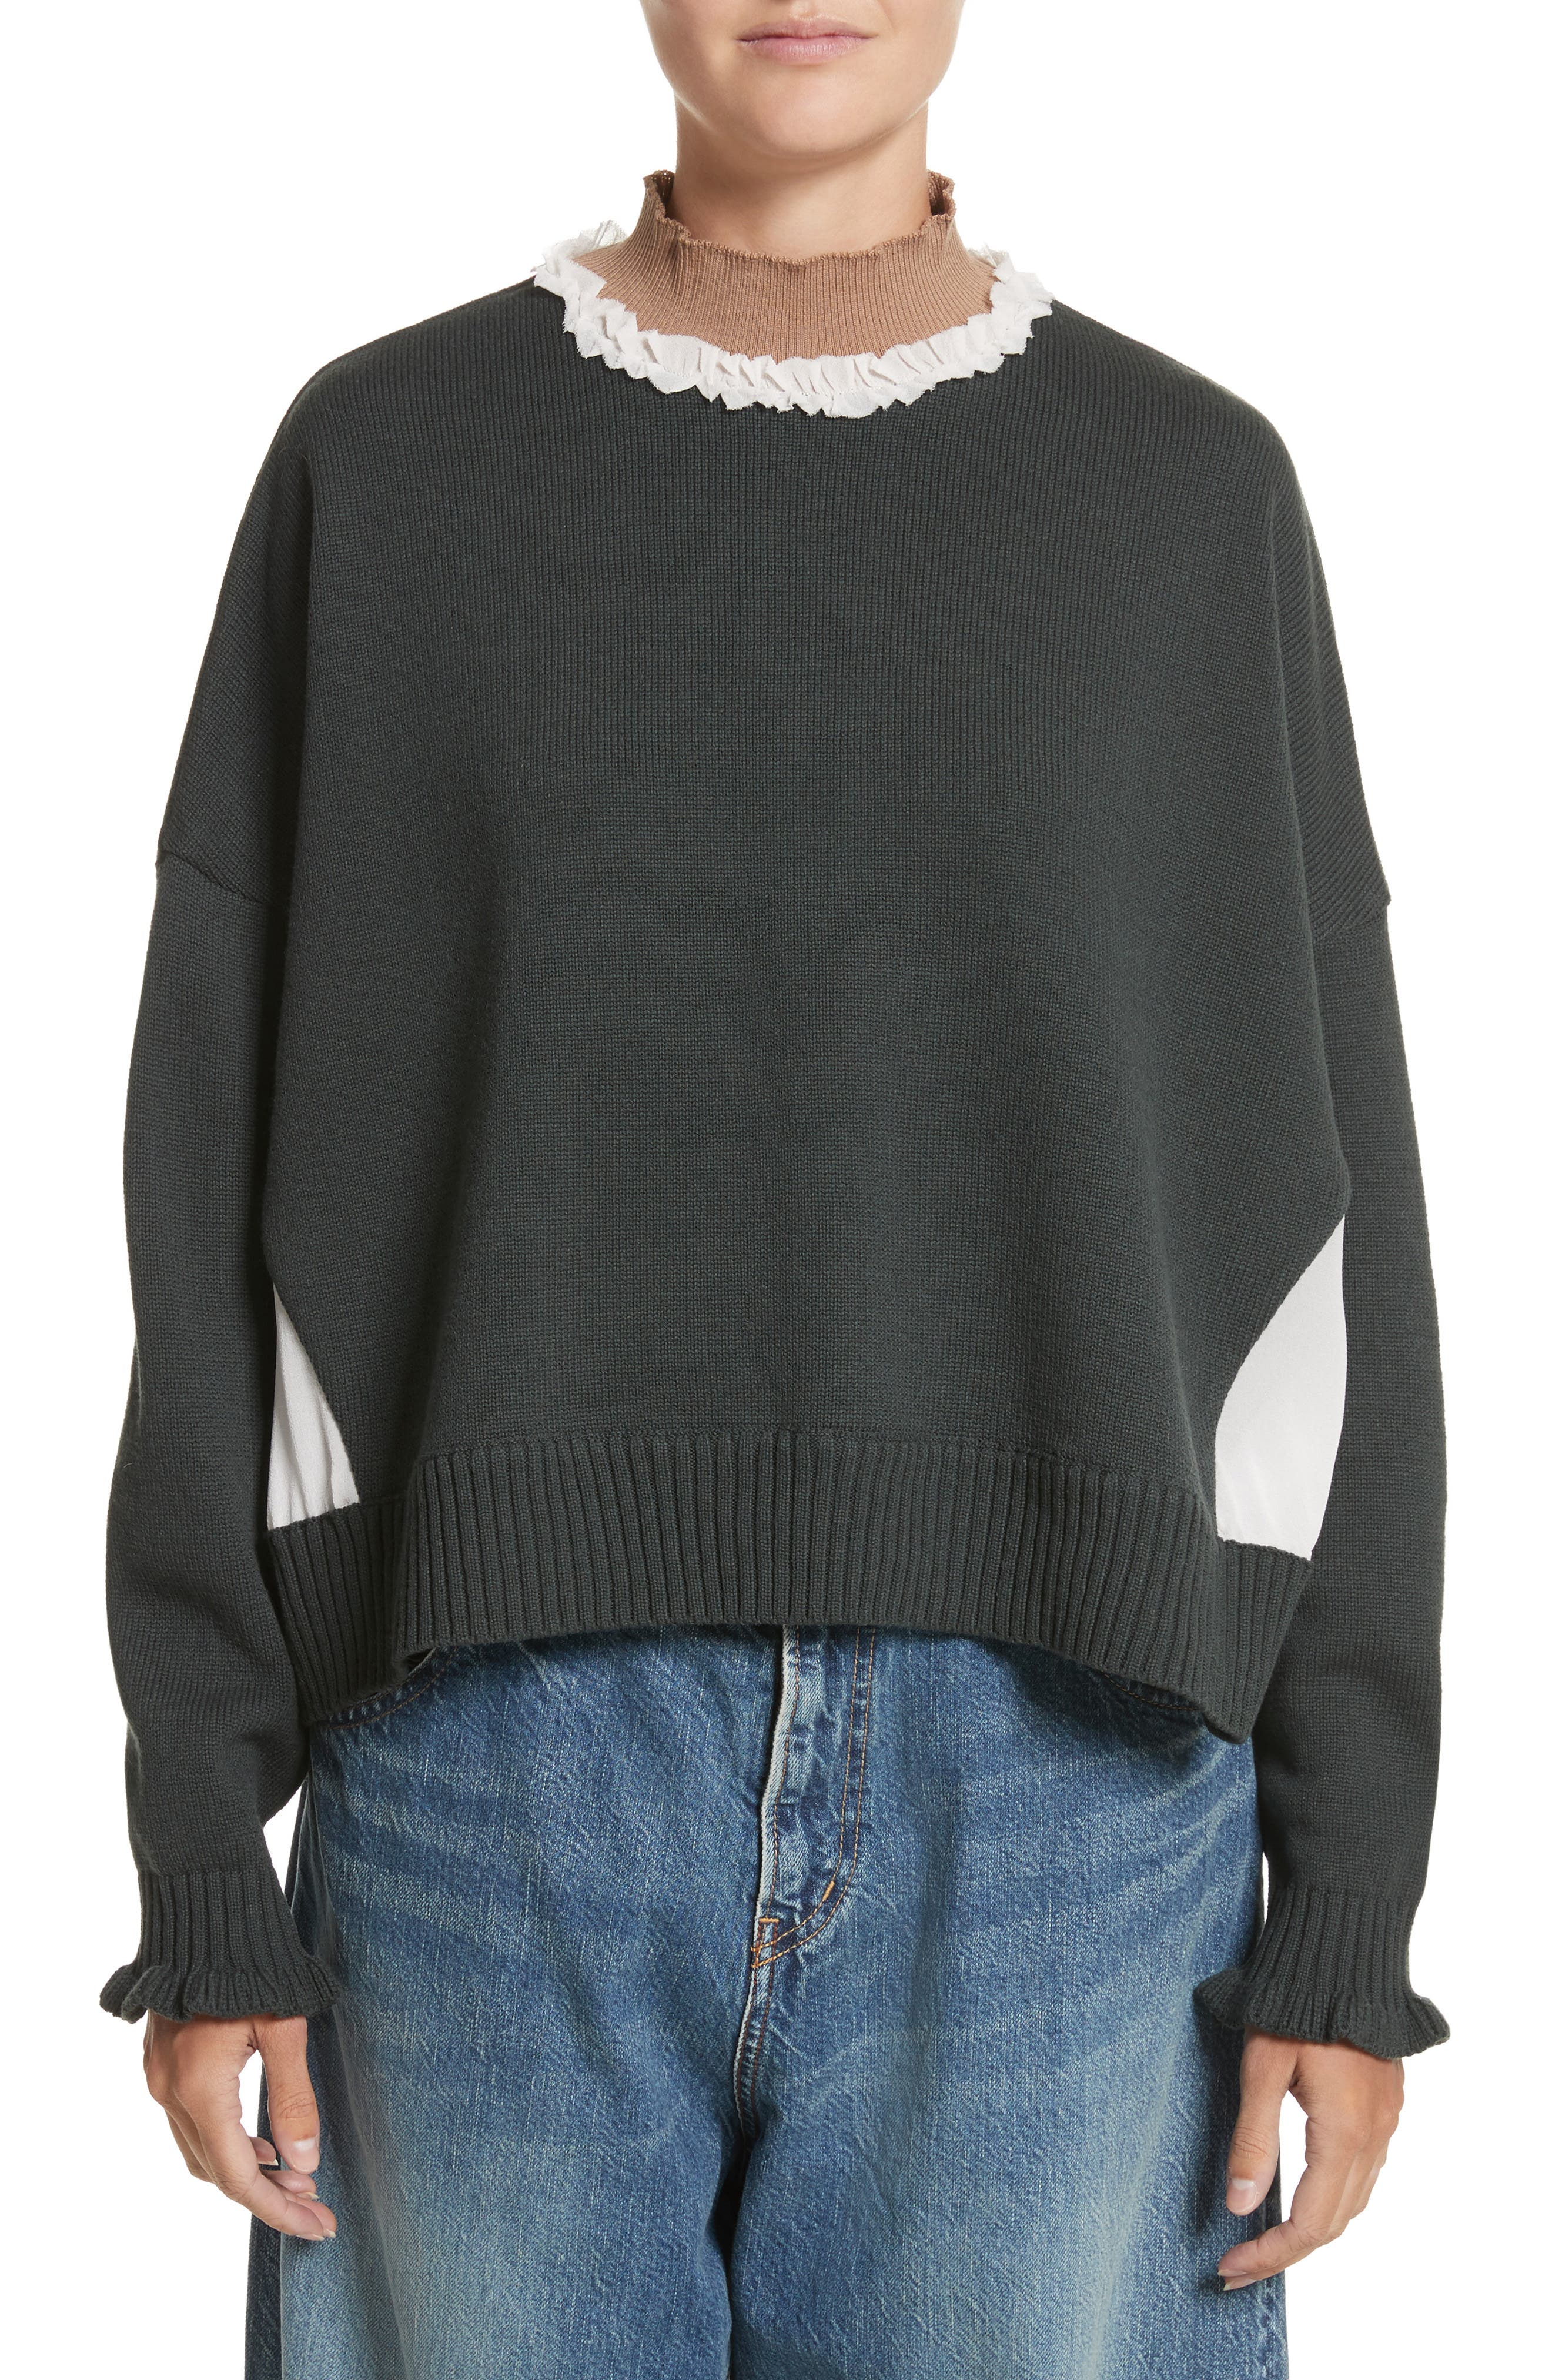 Alternate Image 1 Selected - Undercover Ruffled Mock Neck Sweater